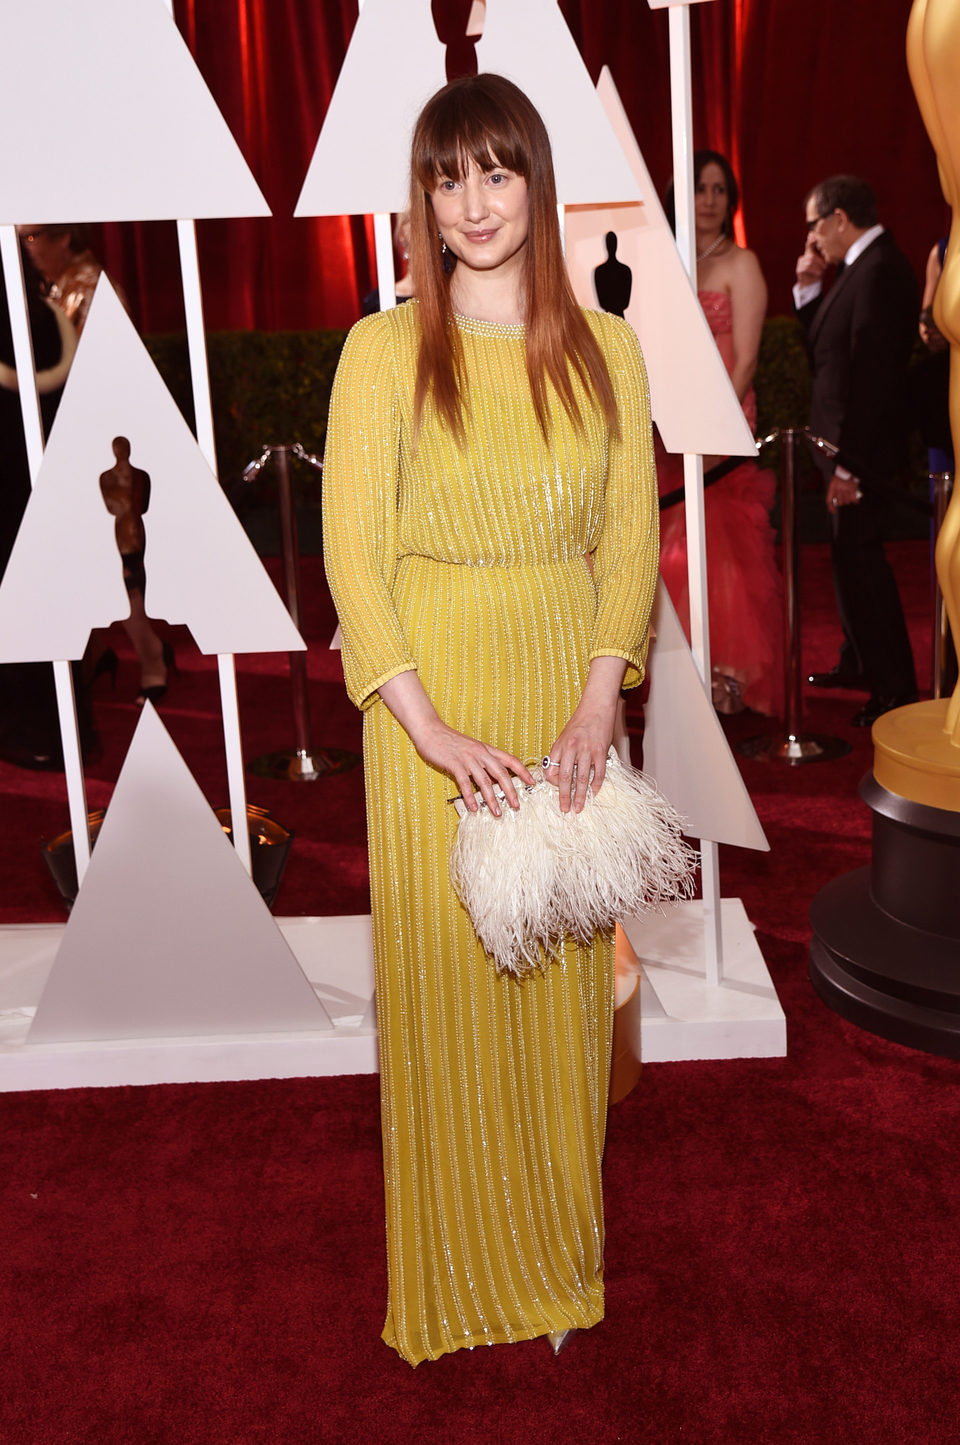 Andrea Riseborough posses in the Oscar 2015 red carpet